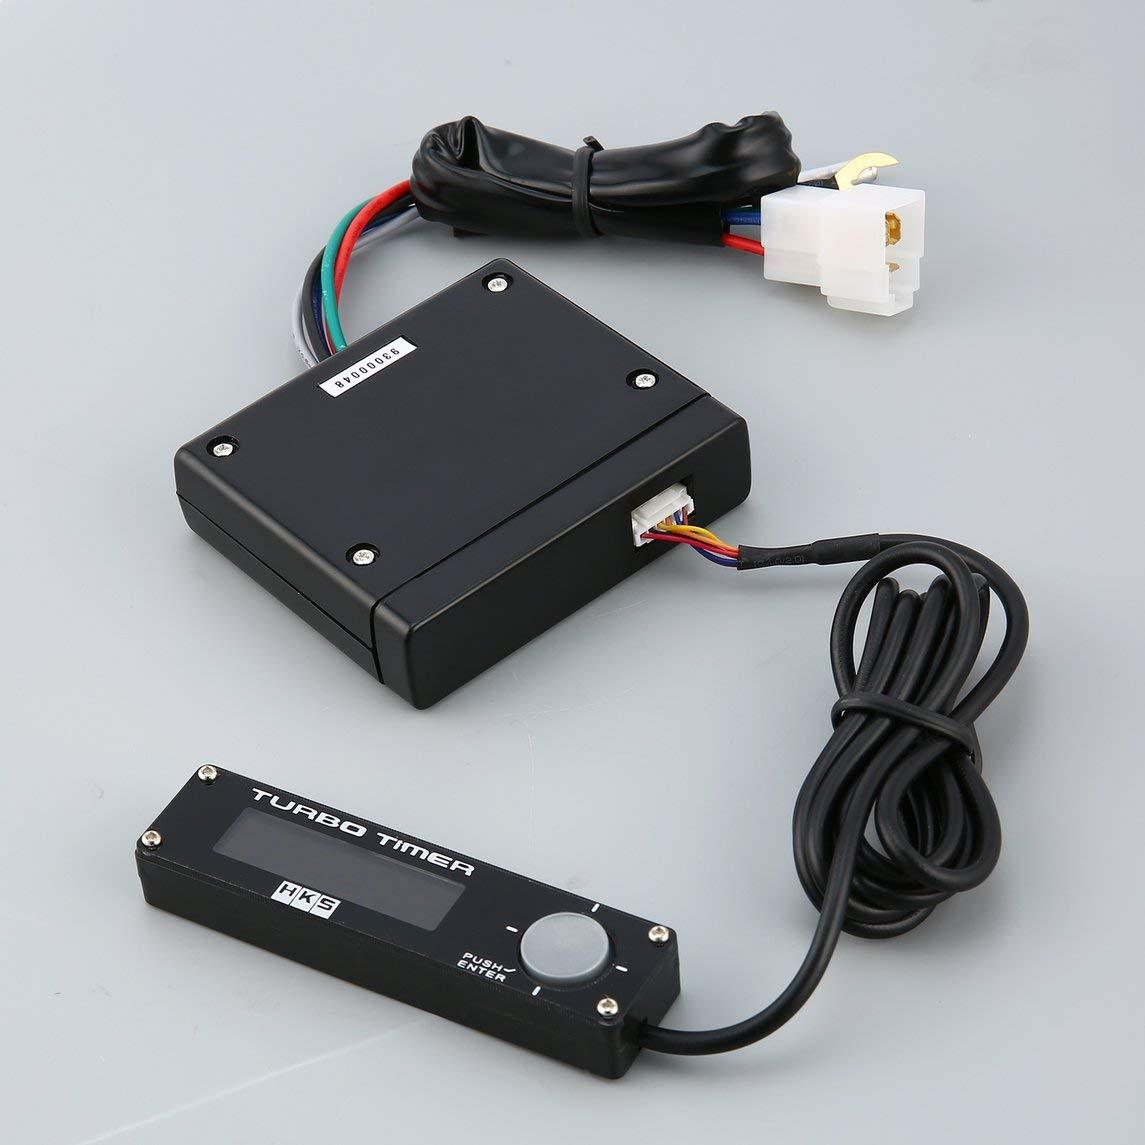 Footprintse Ruedas Coche DC 12V Universal Digital Car Turbo Timer Pantalla LED Boost Timer Controller-Color: Negro: Amazon.es: Coche y moto